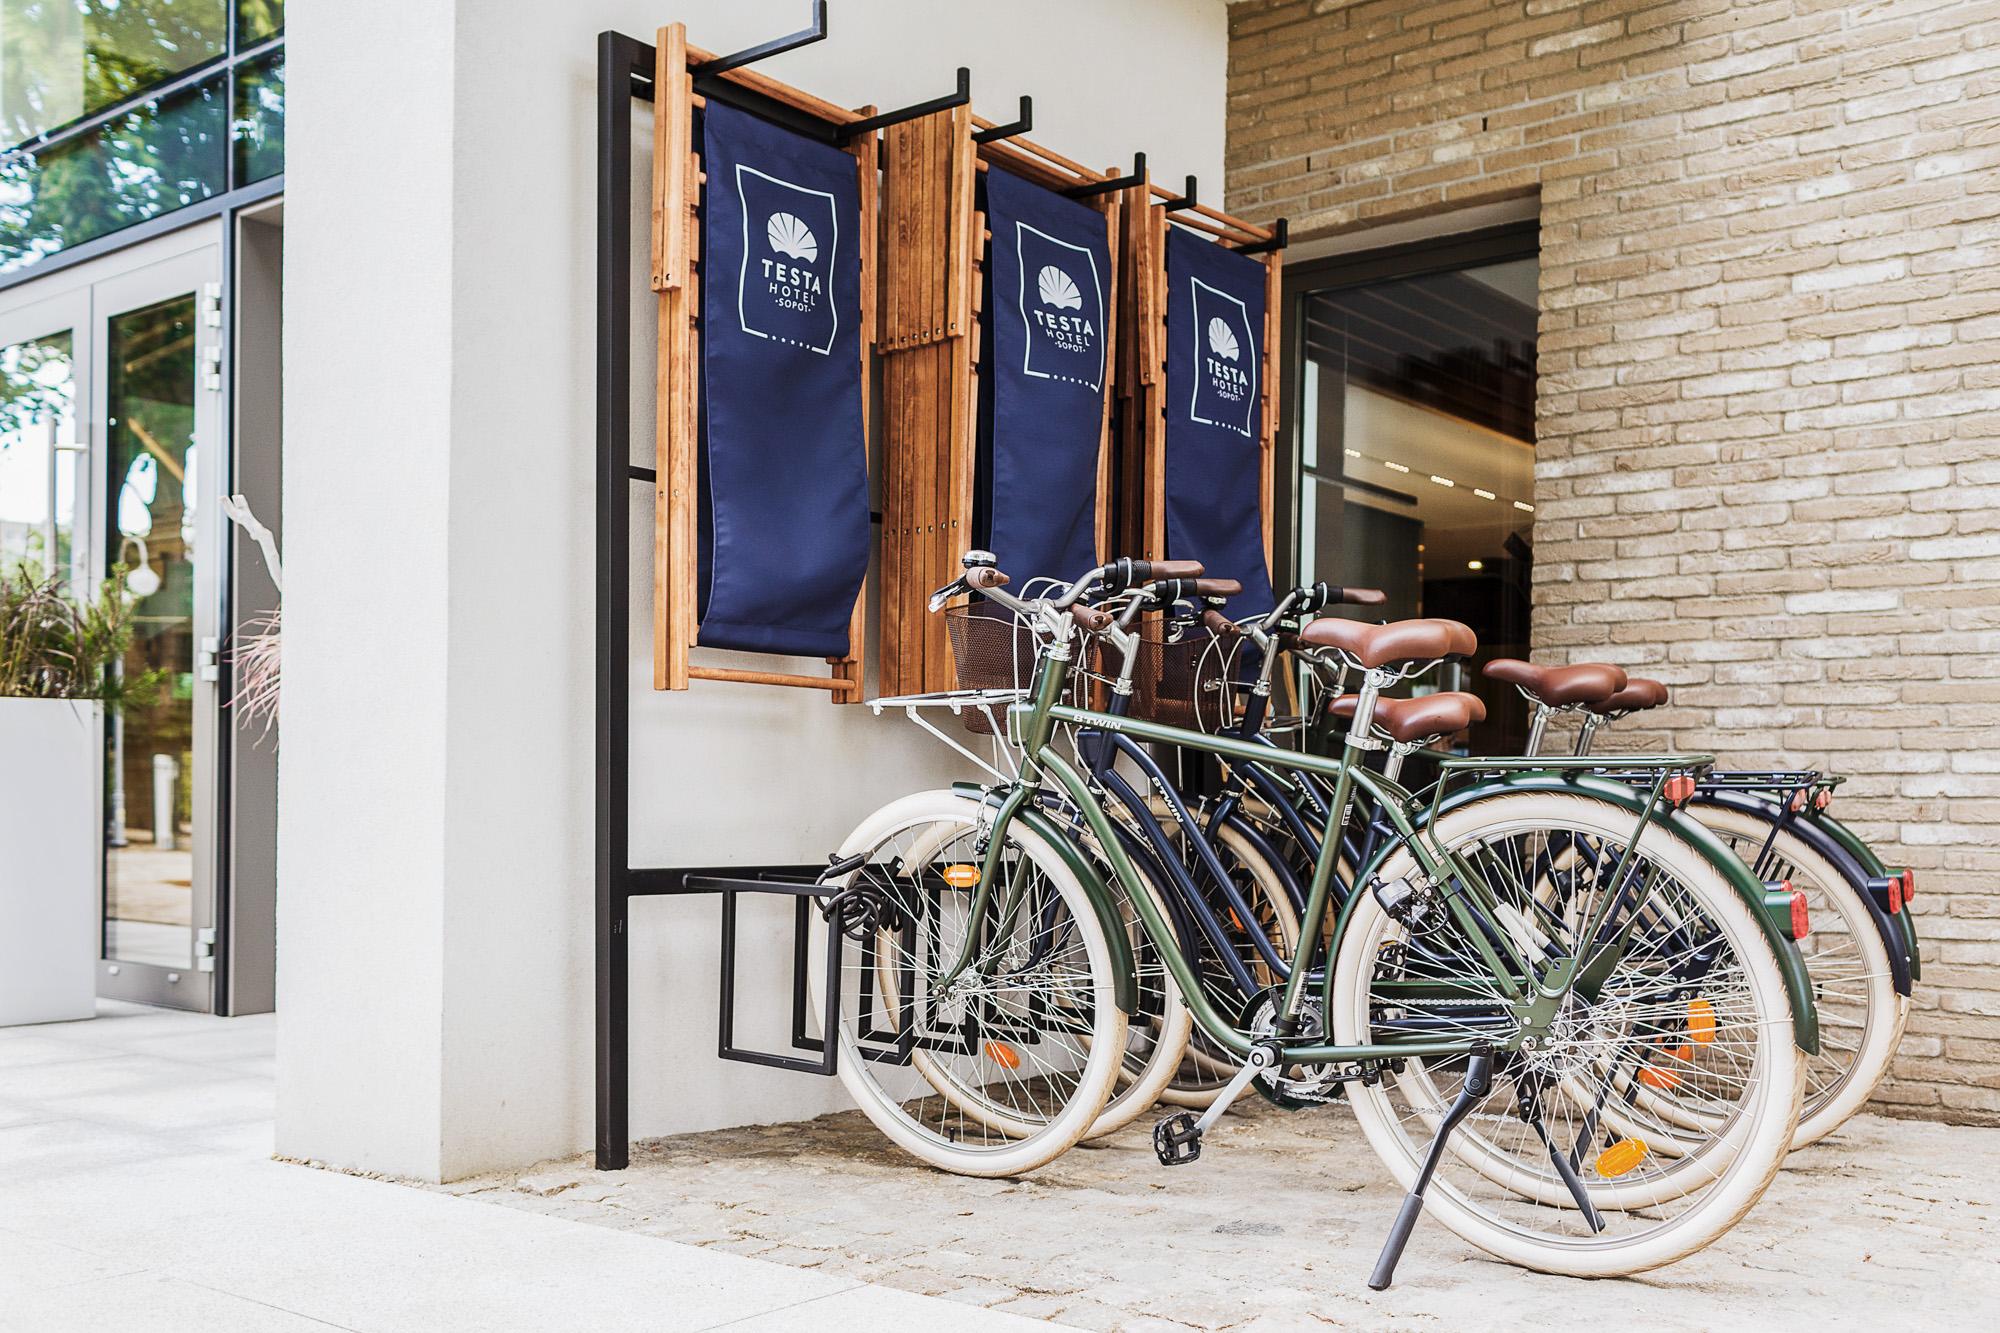 Hotel Testa - Rowery